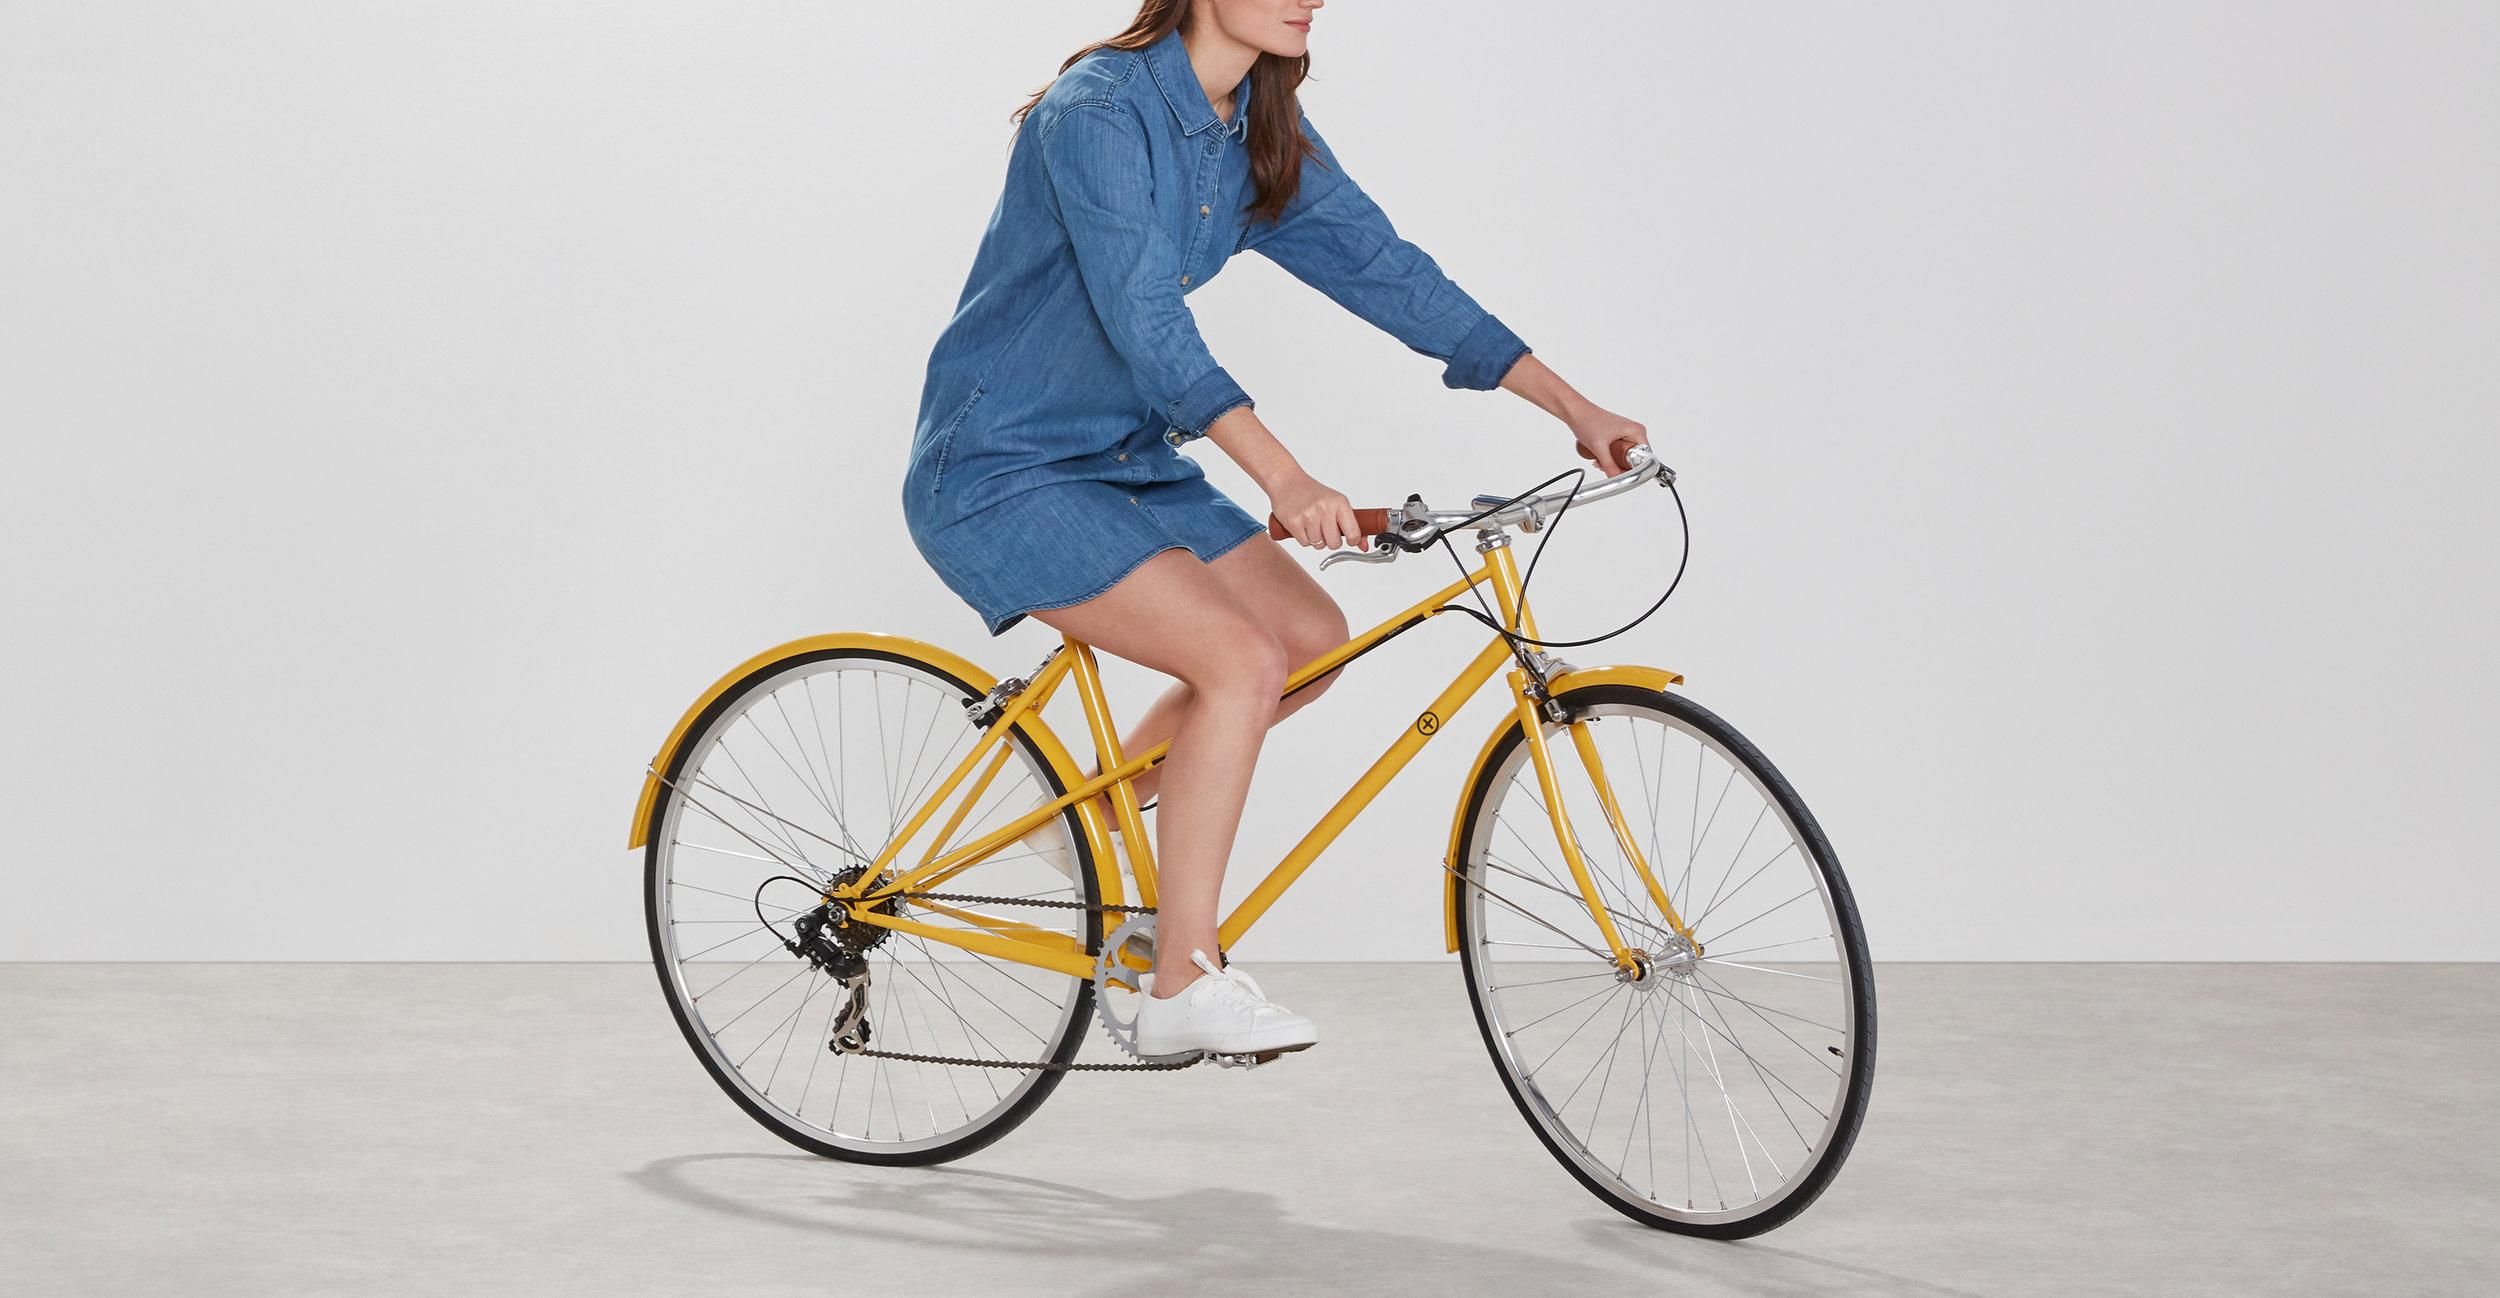 BIKBLM001YEL-UK_Bloomsbury_7_Speed_City_Bike_Mustard_SM_LB02.jpg